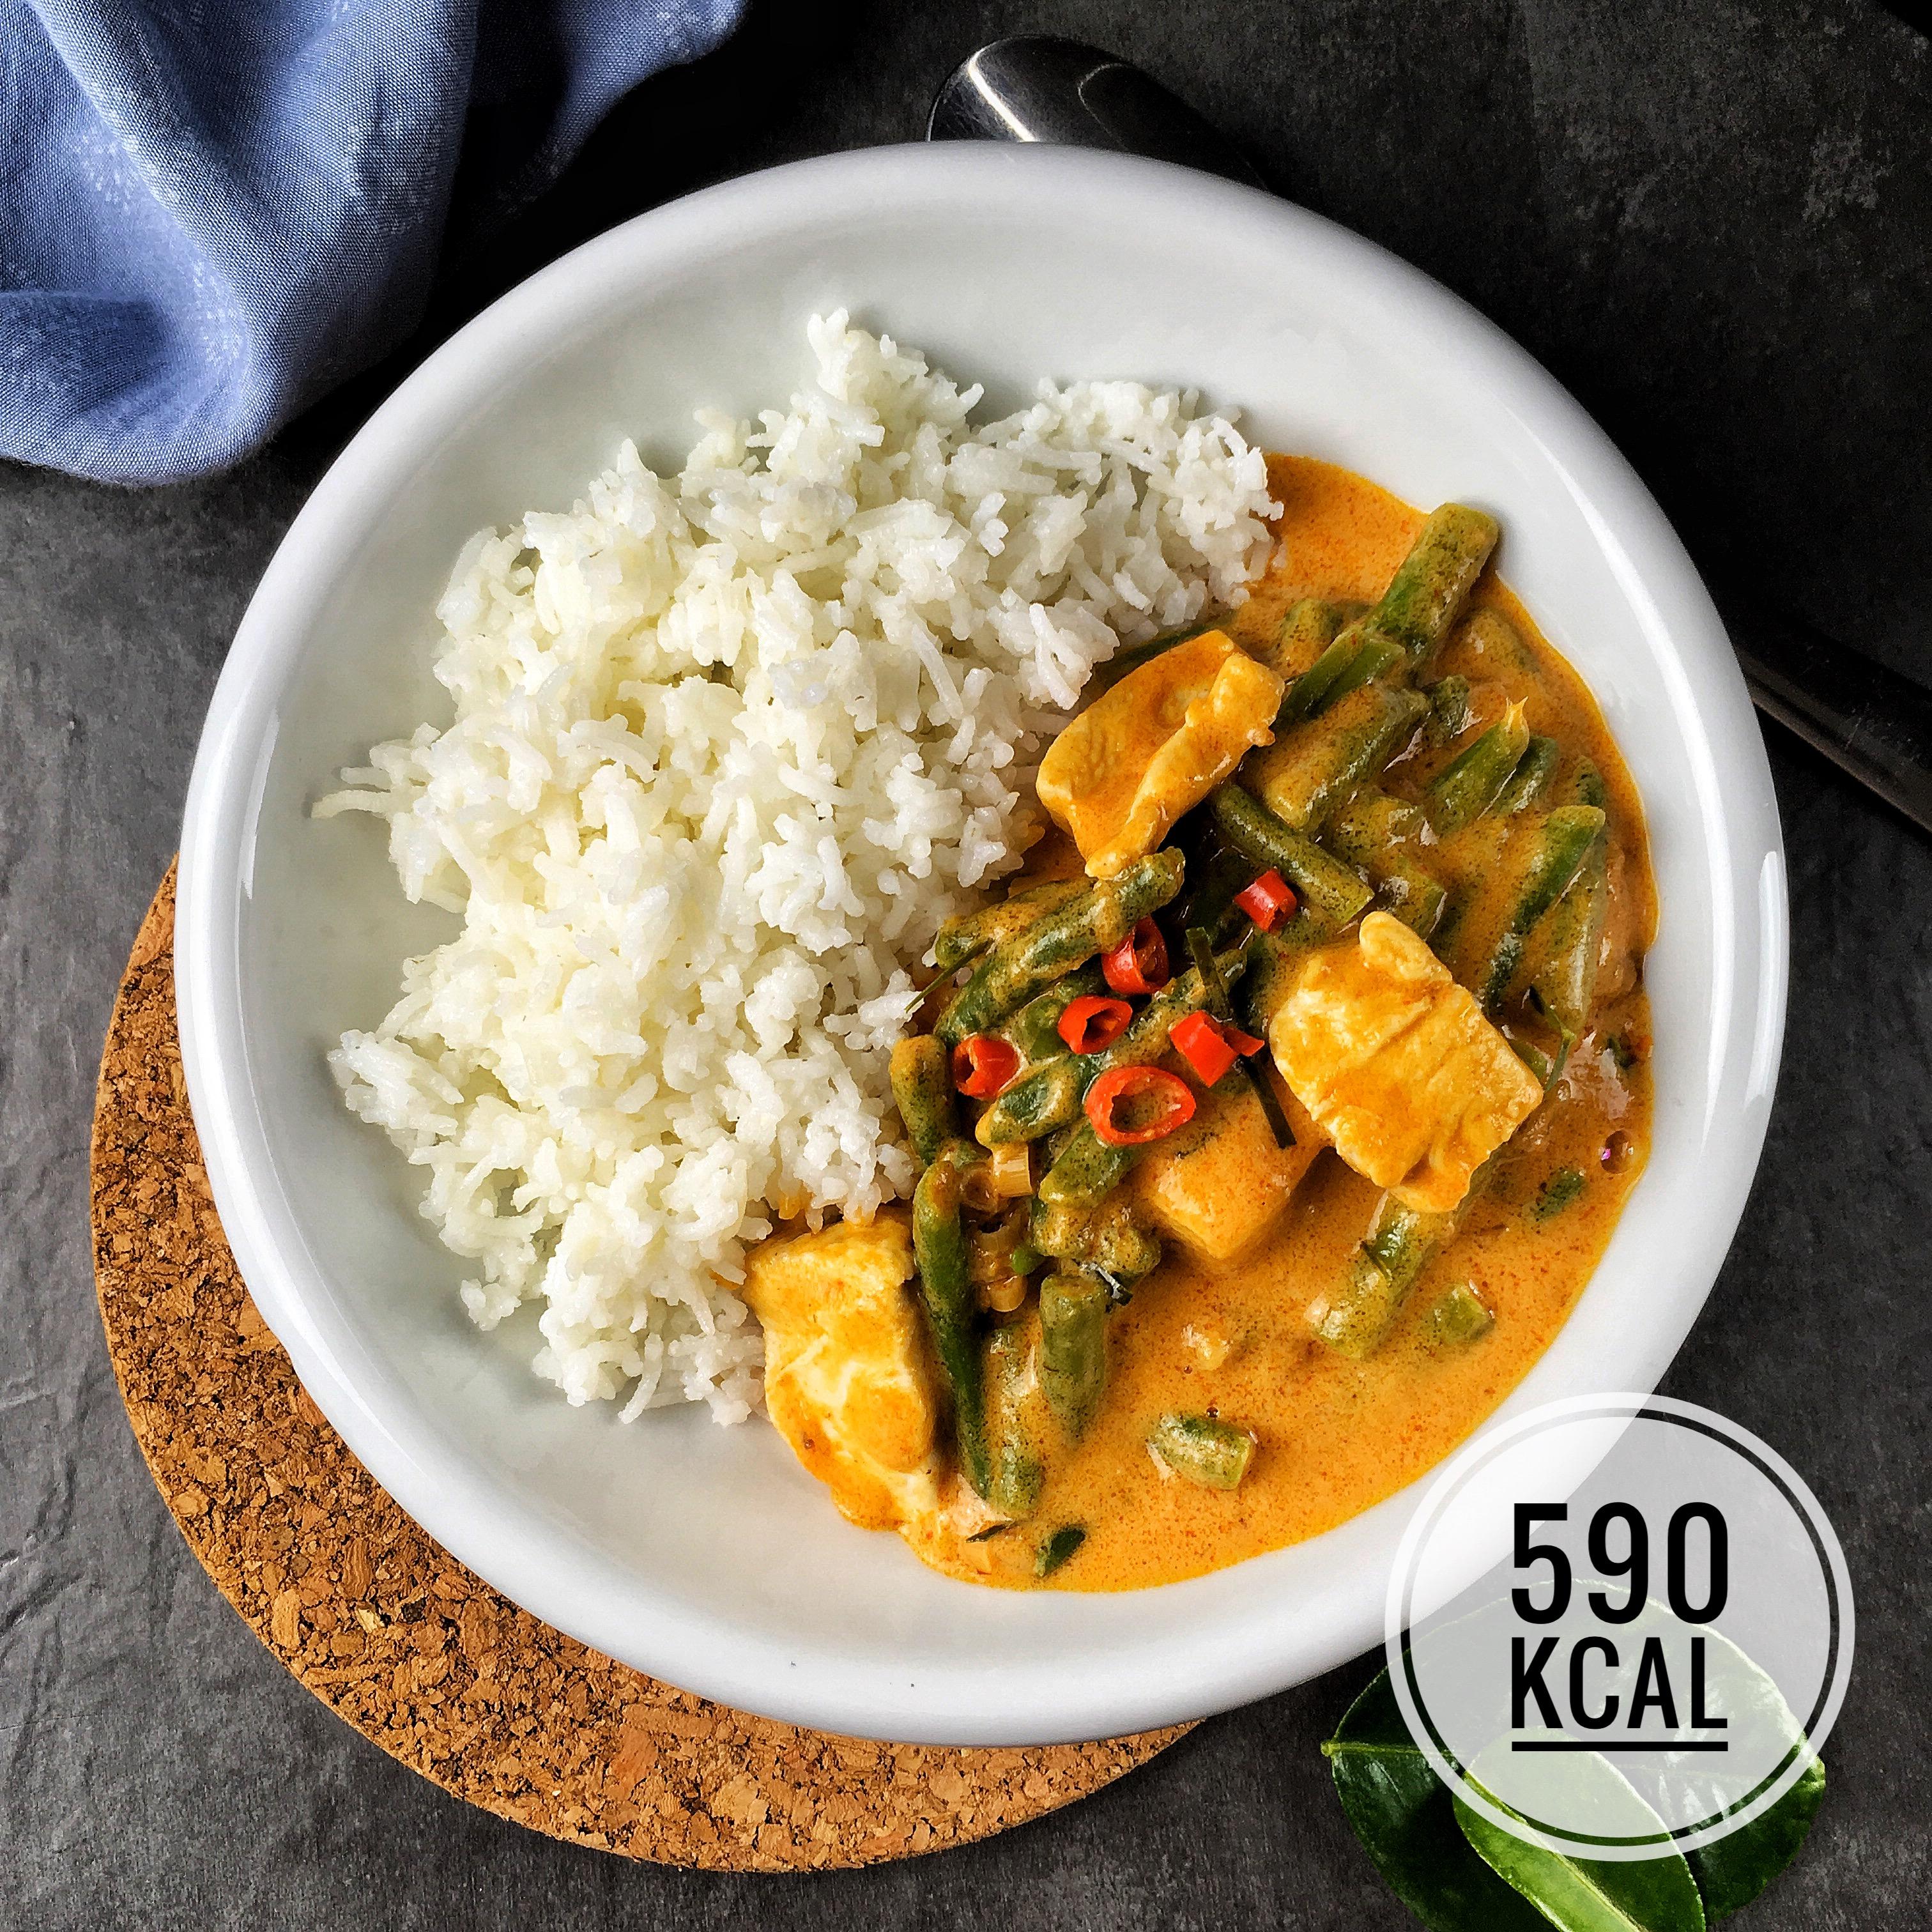 Kalorienarmes Panang-Erdnuss-Curry – richtig lecker und total einfach!